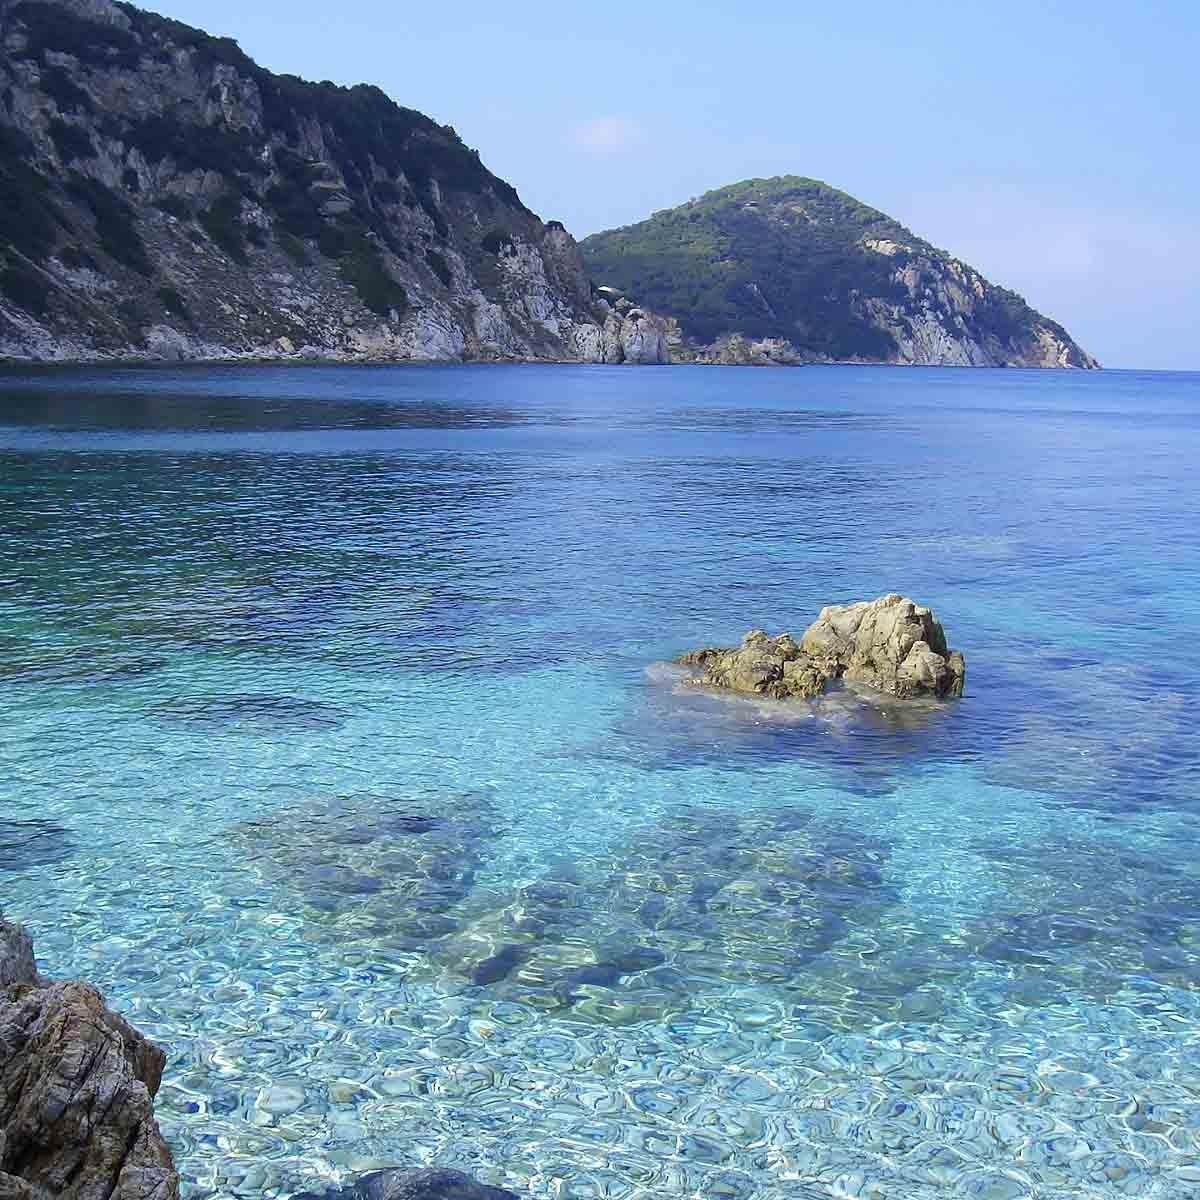 Tagesausflug nach Elba